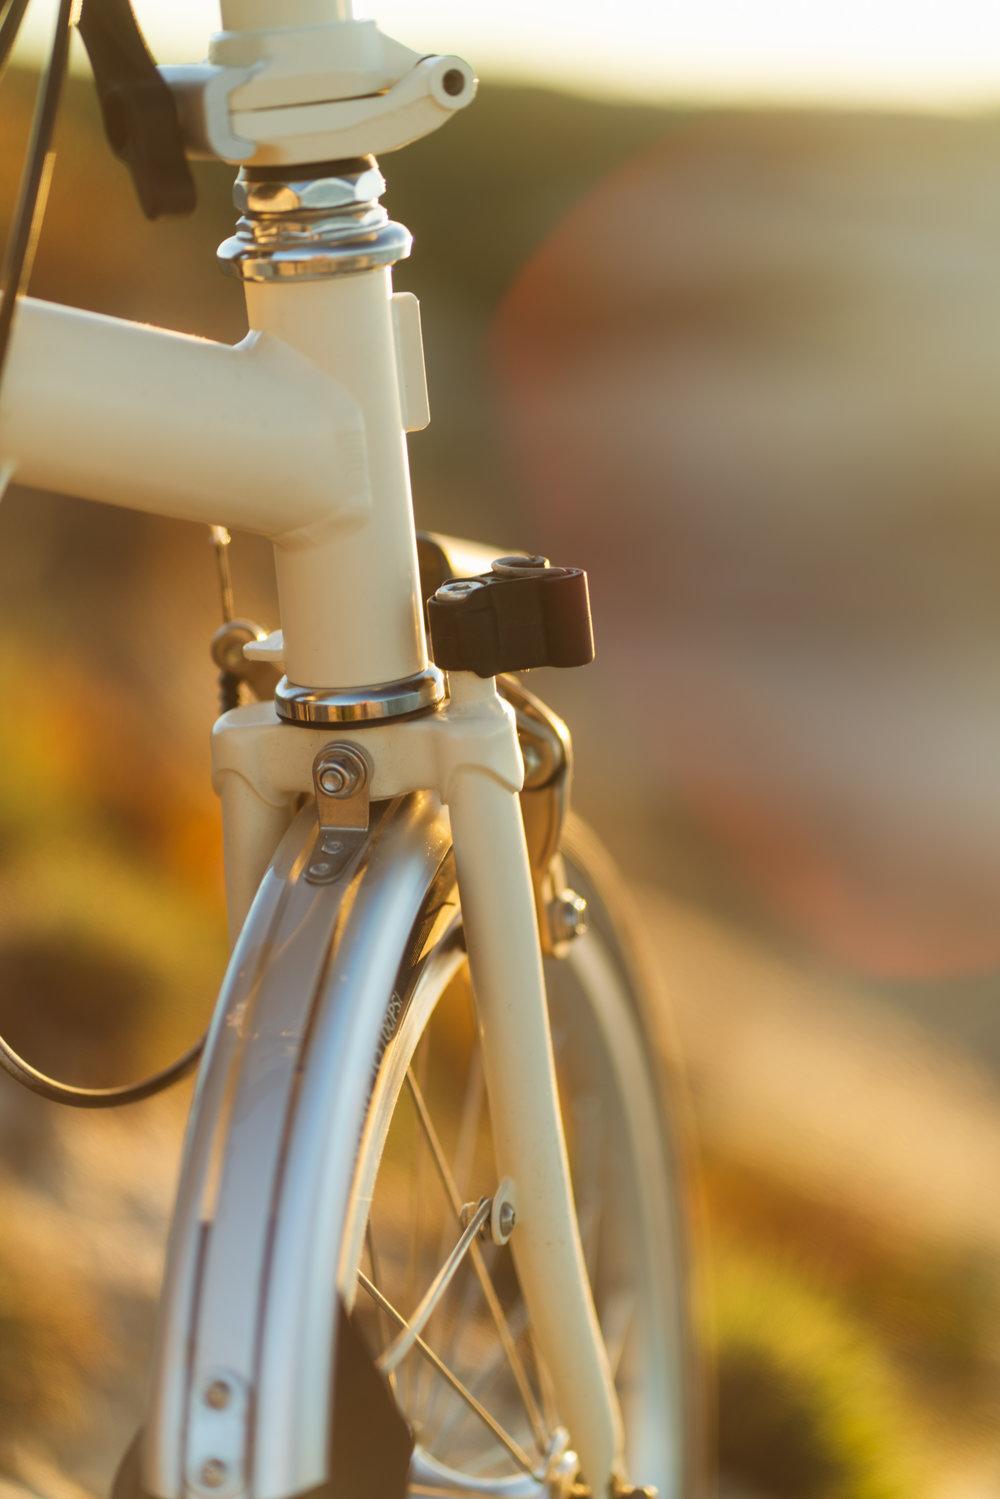 Brompton bike detail with sunset light.